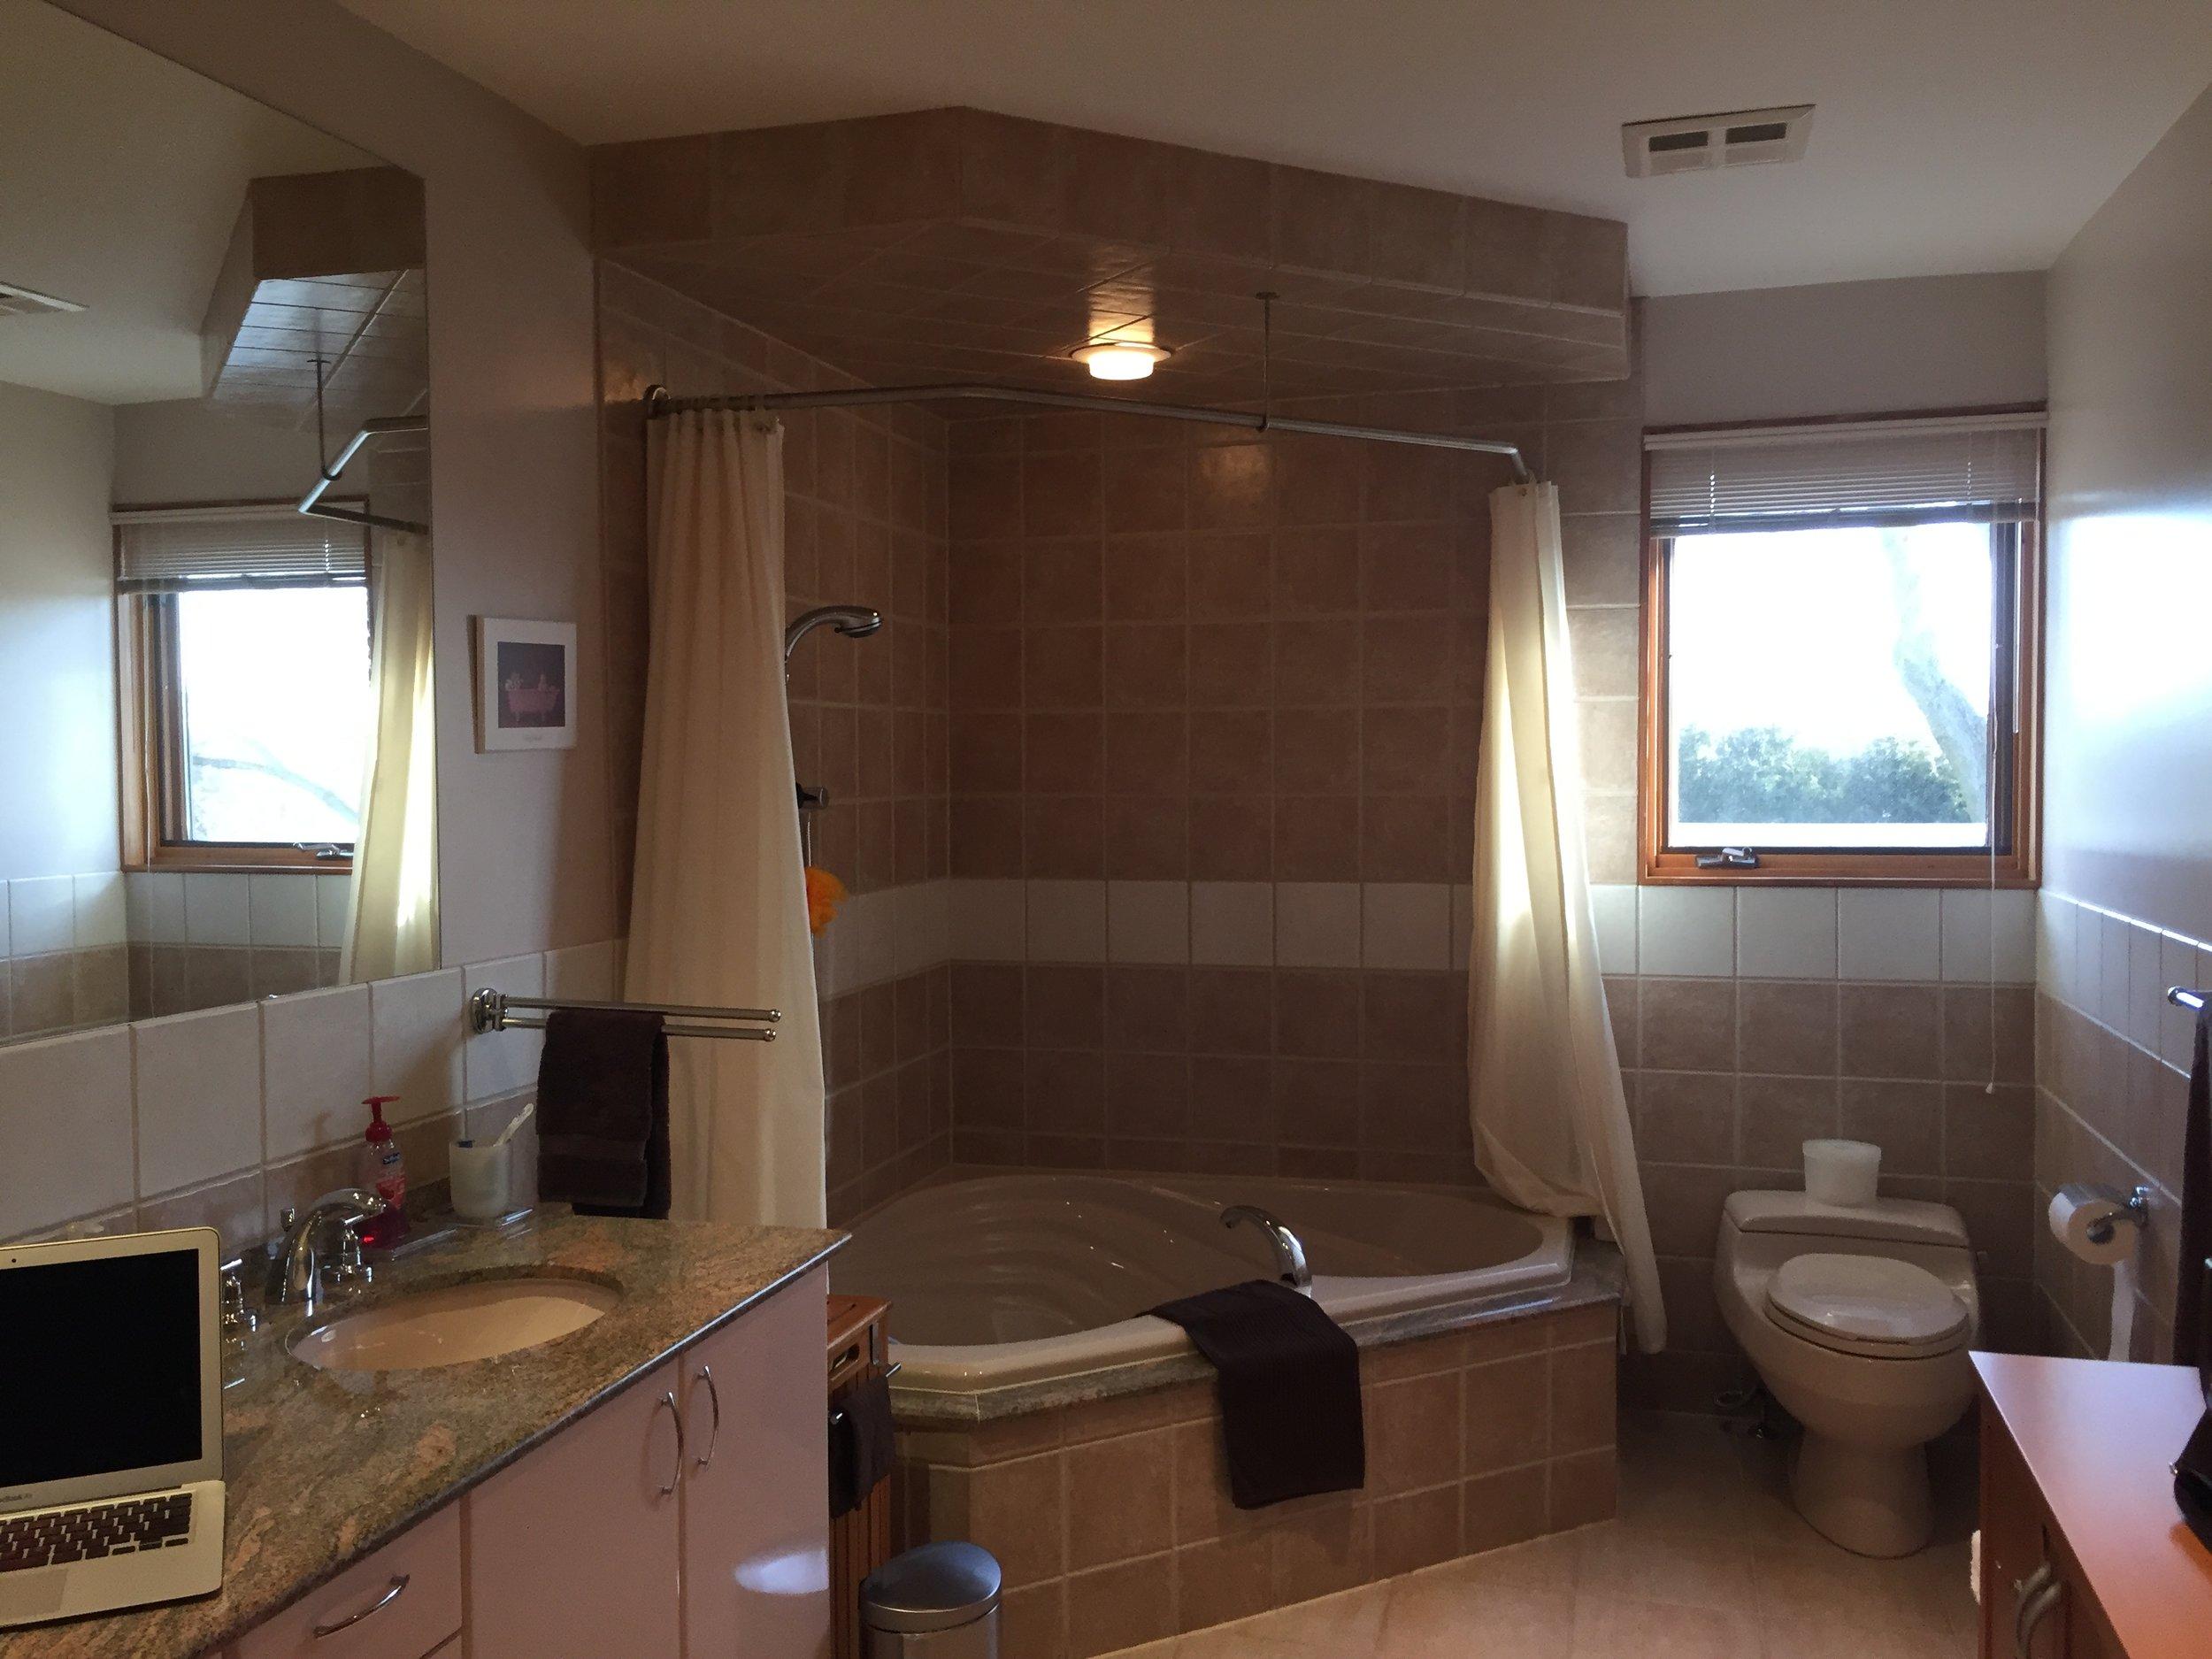 163 Garden bathroom before images (4).jpg